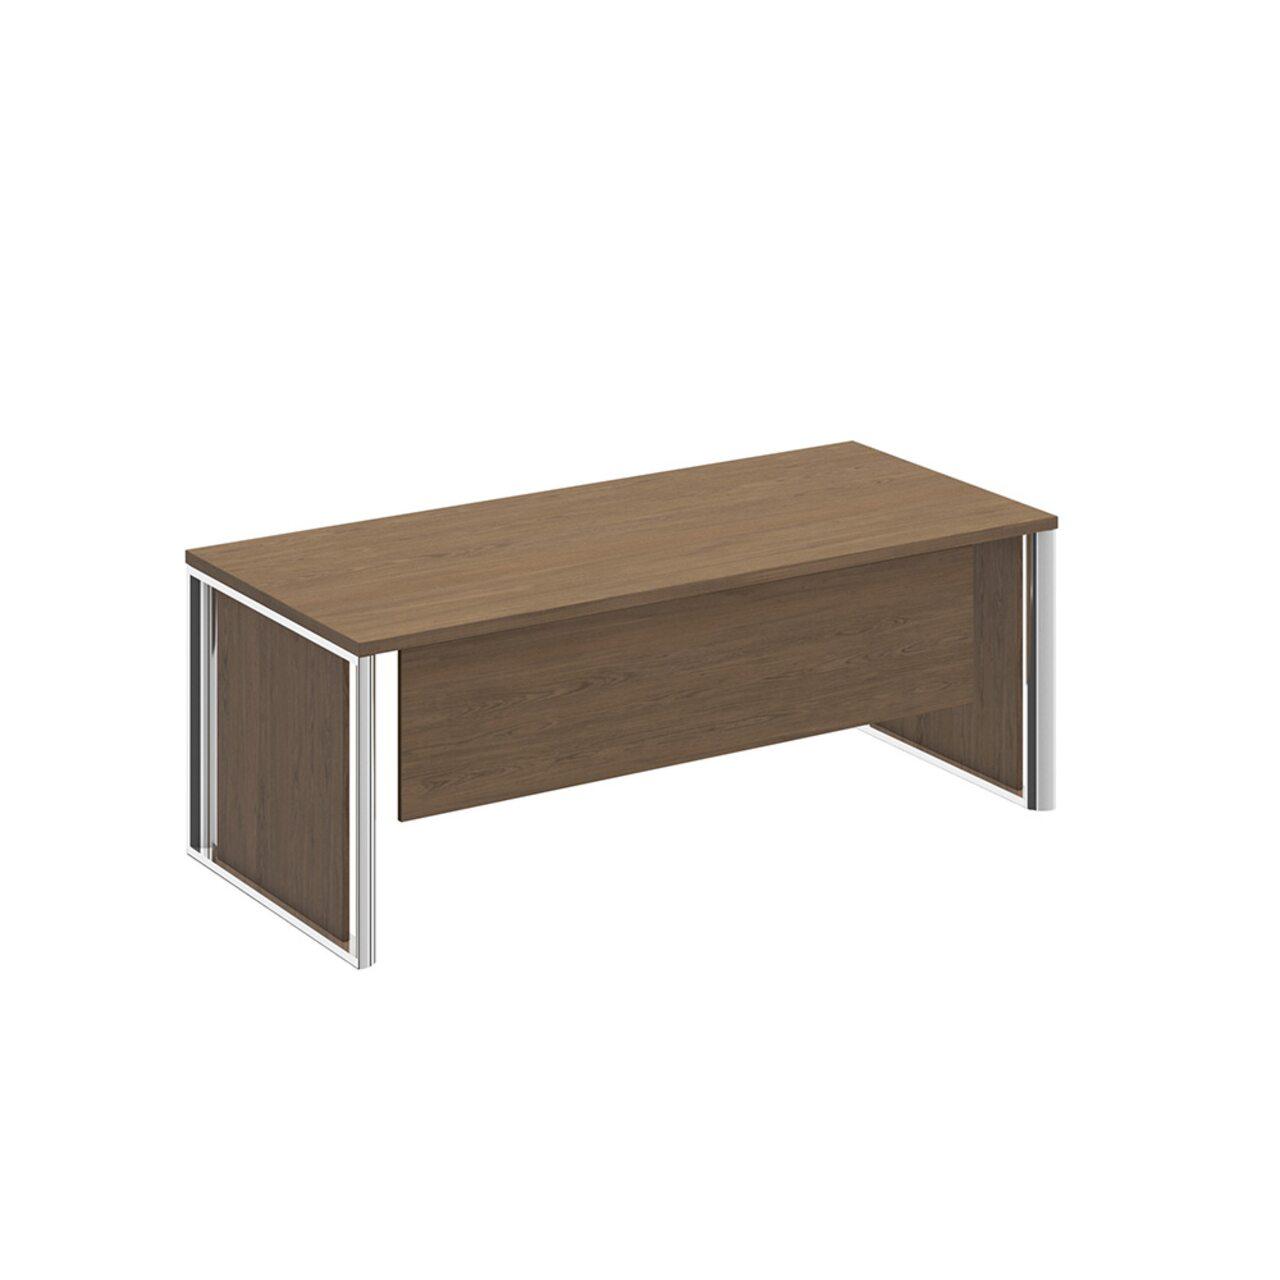 Стол руководителя с декоративными вставками  ORION 200x90x75 - фото 1